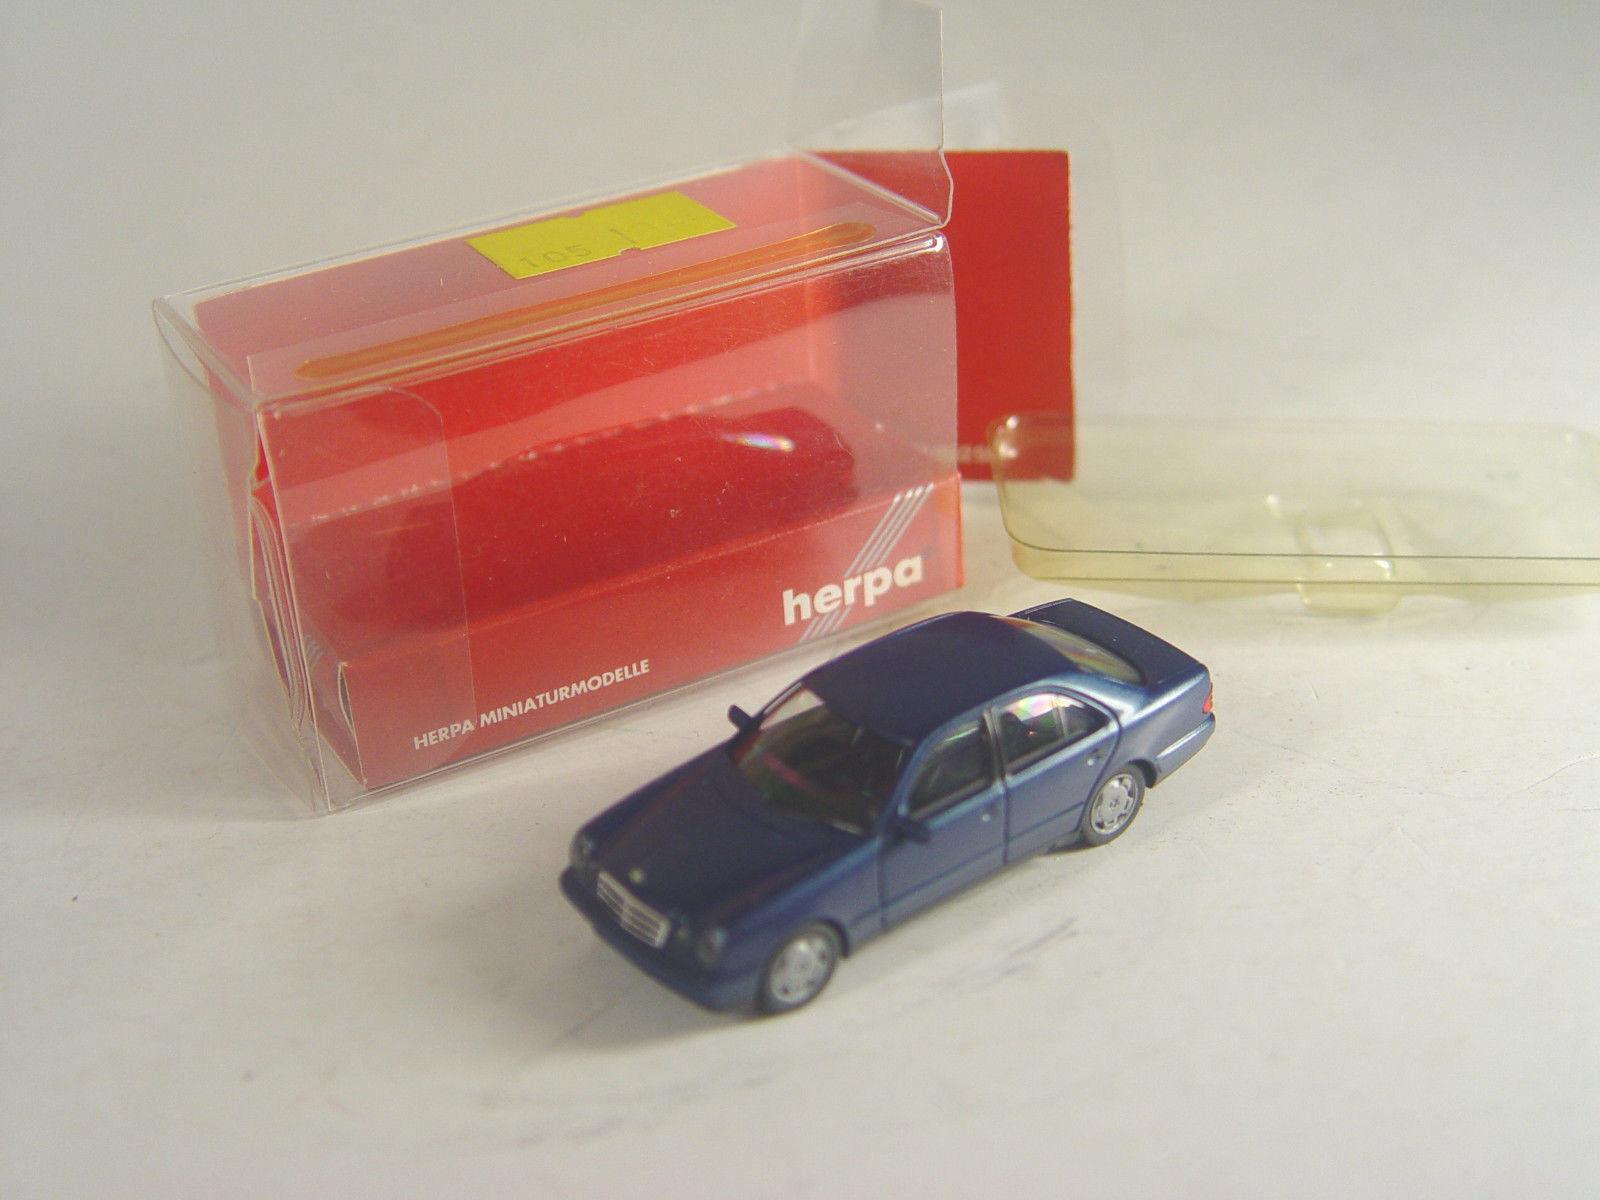 MB E 280 in dunkelblau-metallic mit OVP #14 Herpa 031813 1:87